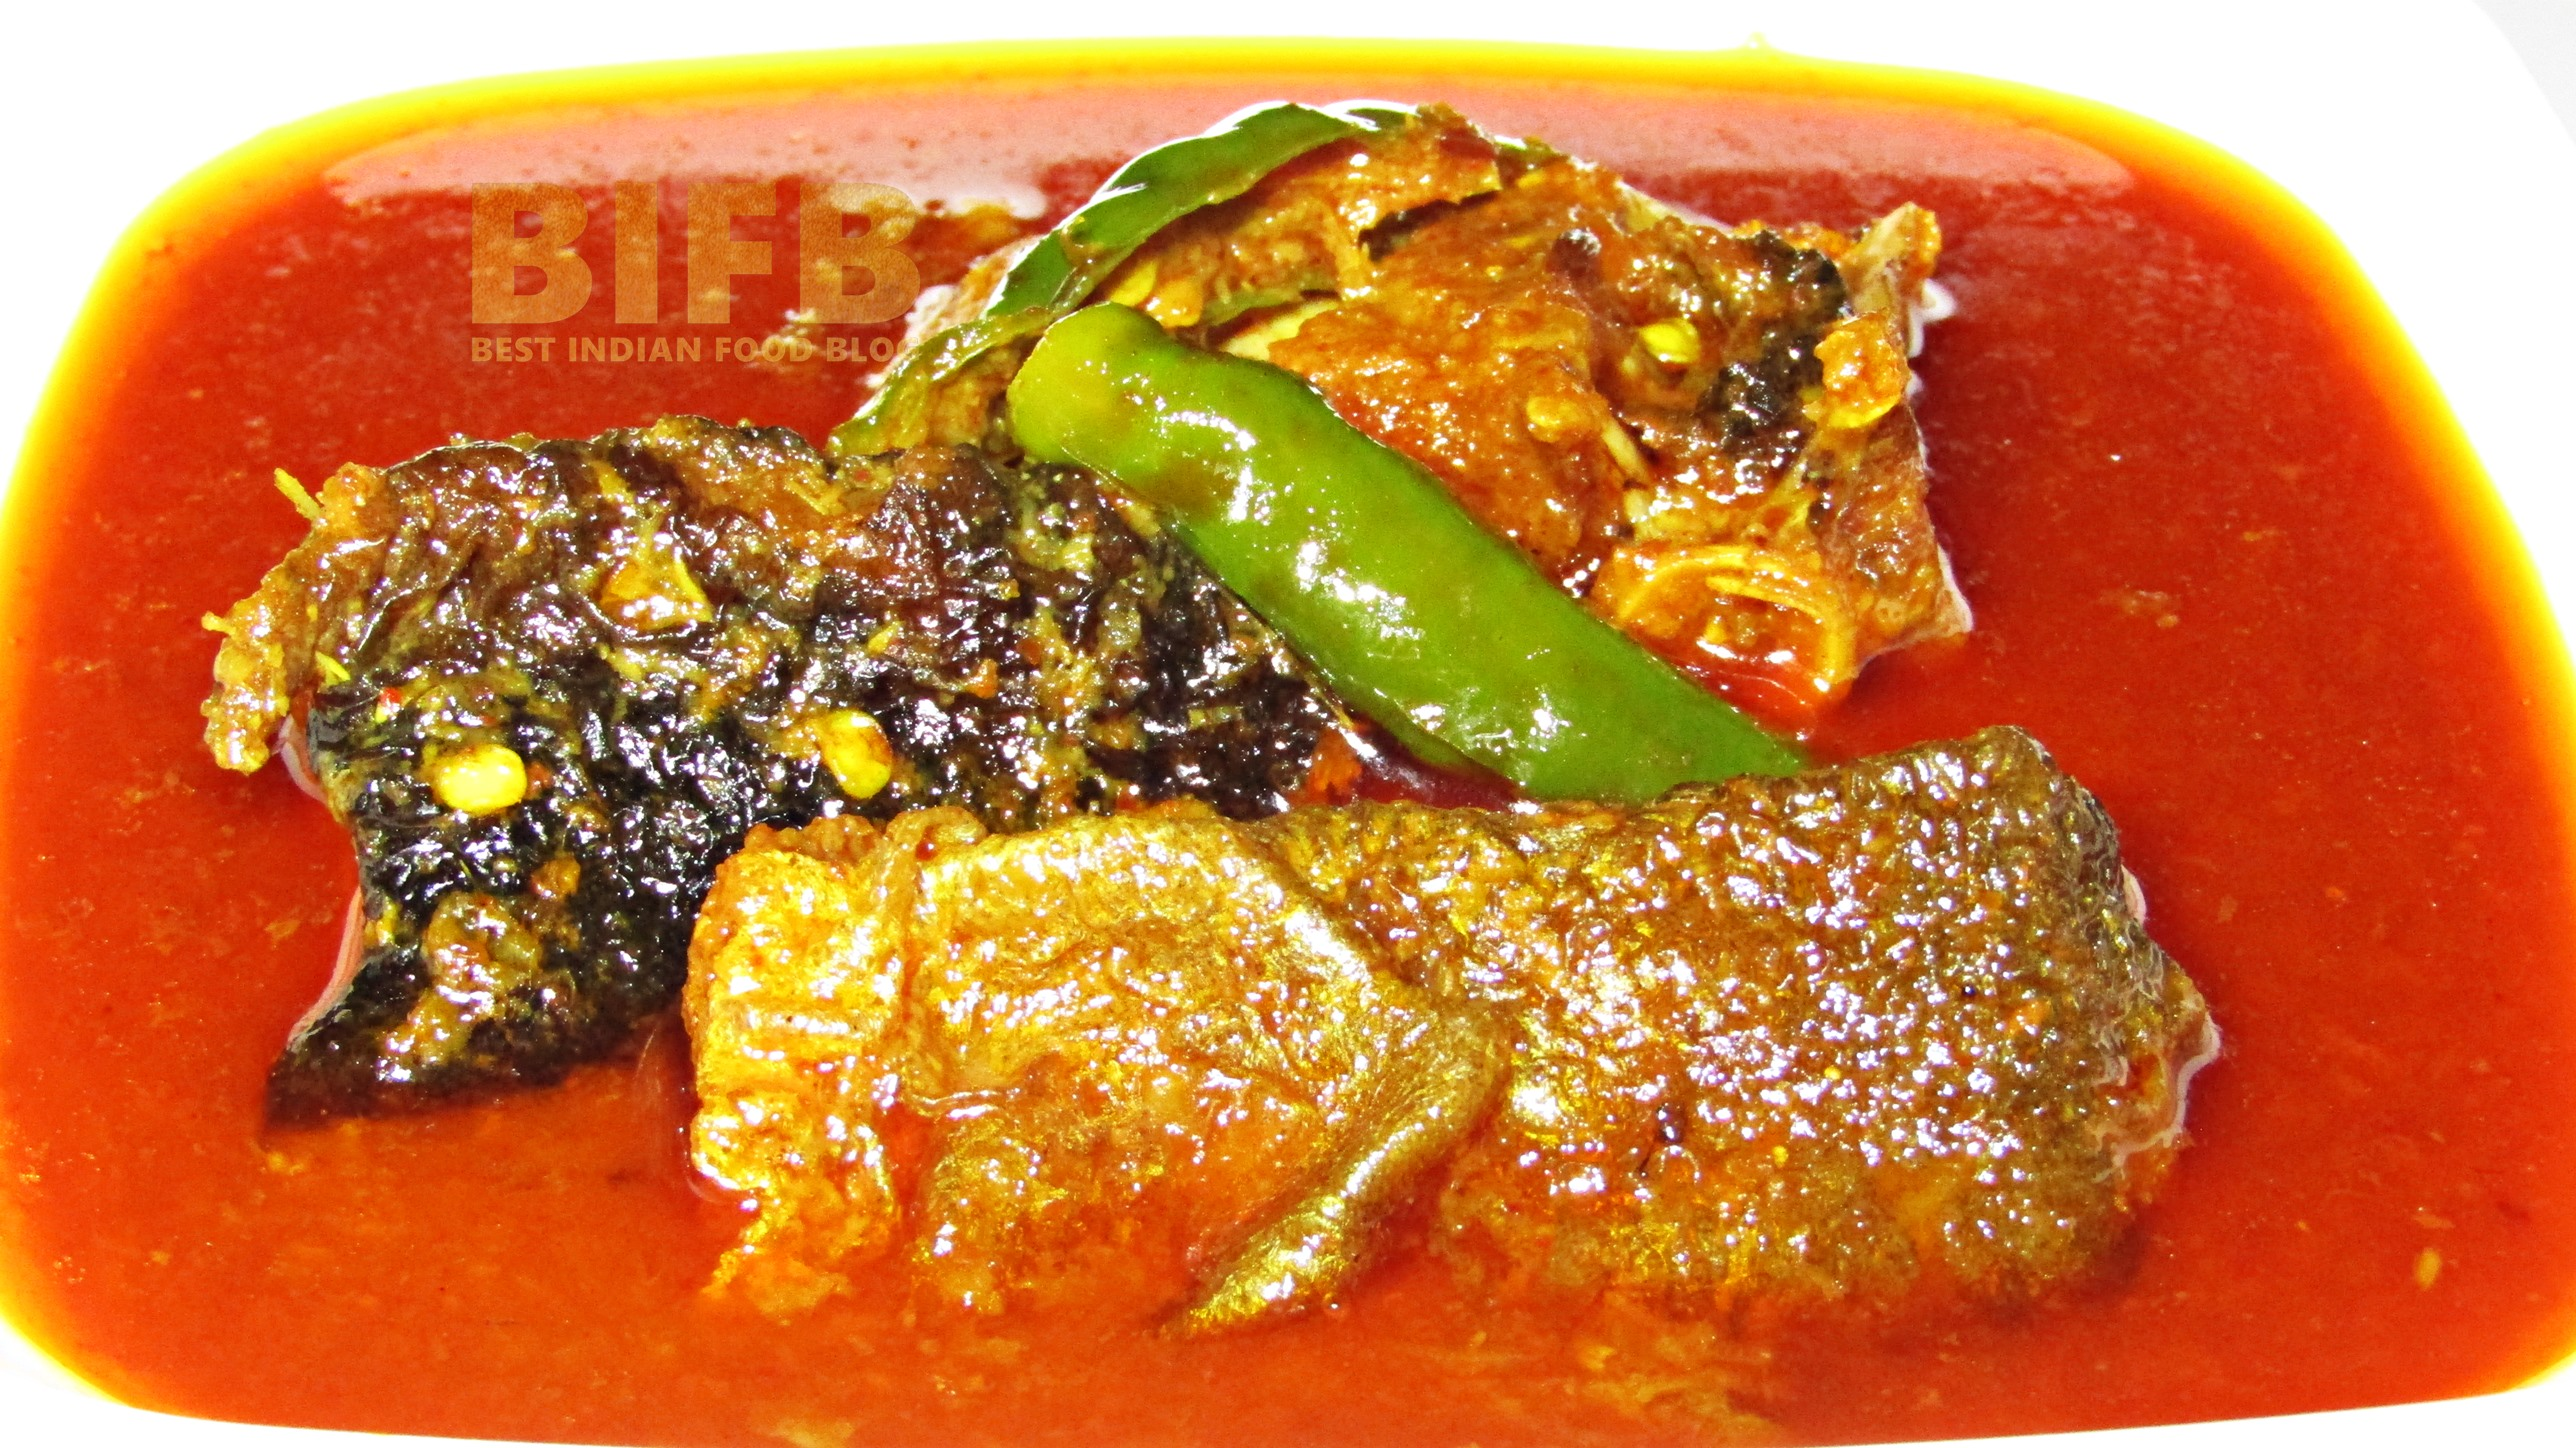 Pangaser Jhol from West Bengal, India | Best Indian Food Blog | Pangasius Fish recipe